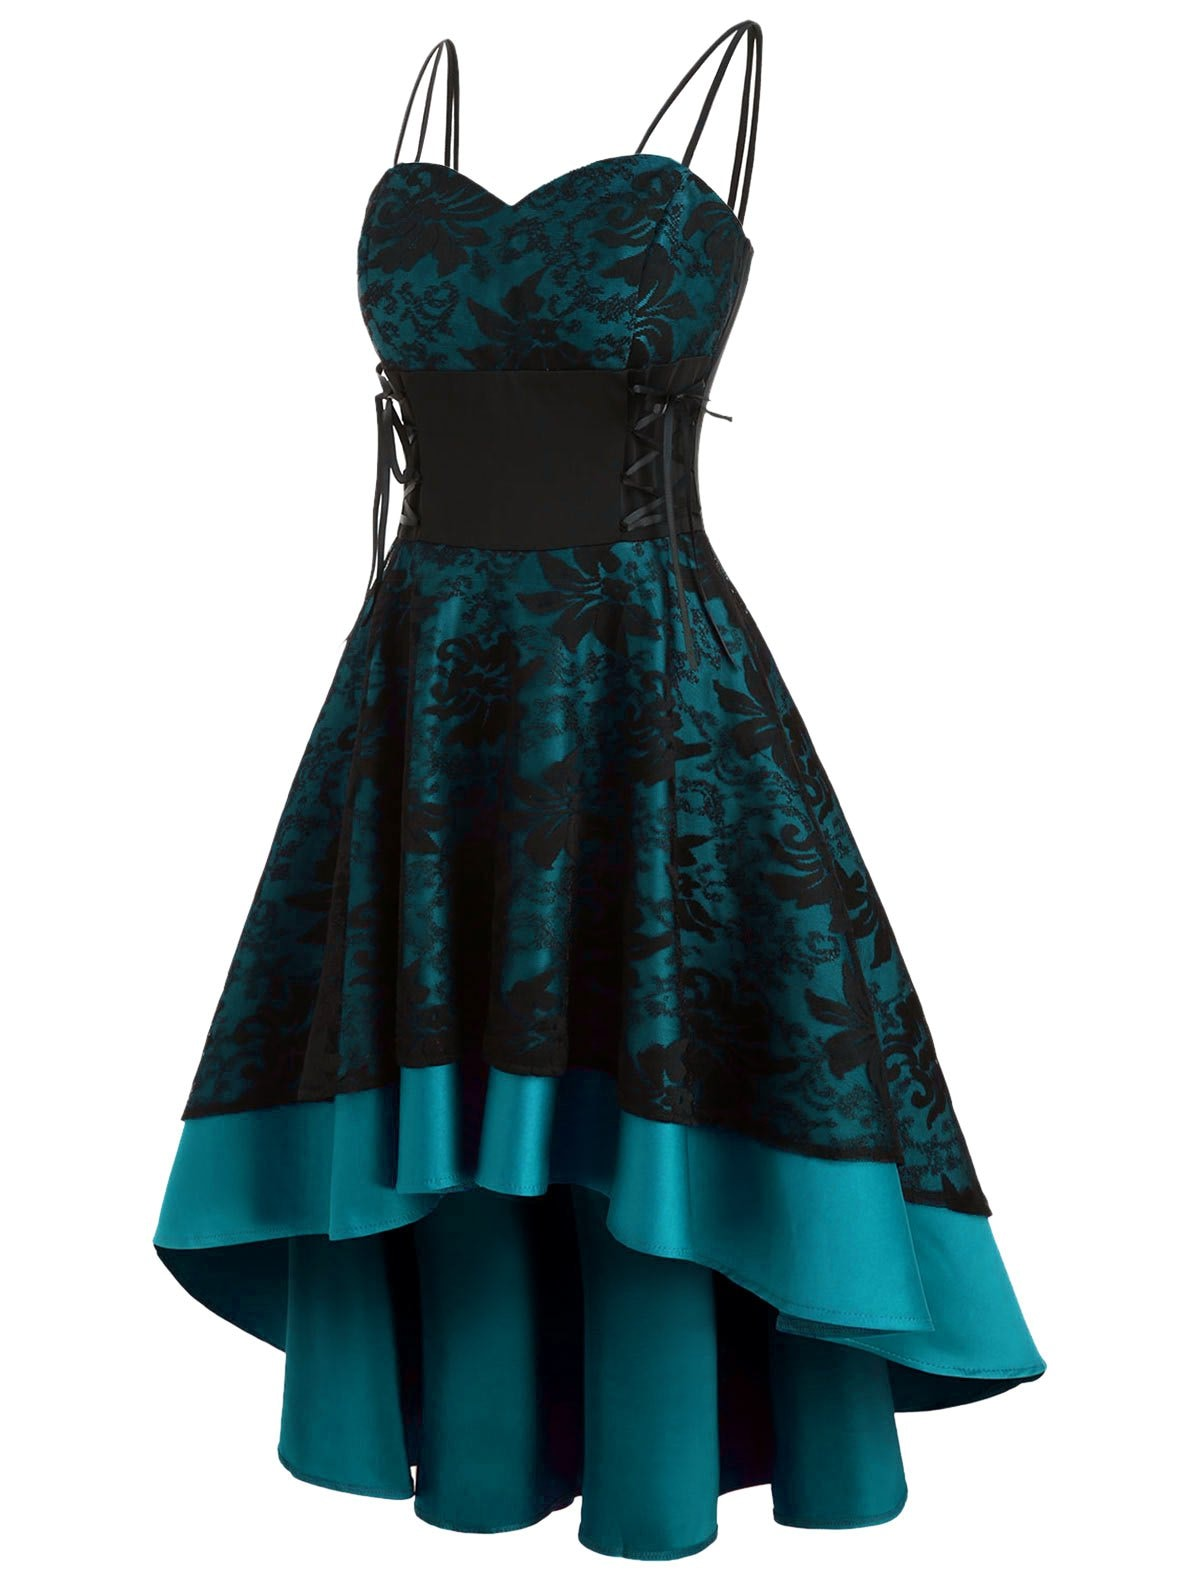 Lace Up Empire Waist Dip Hem Party Dress